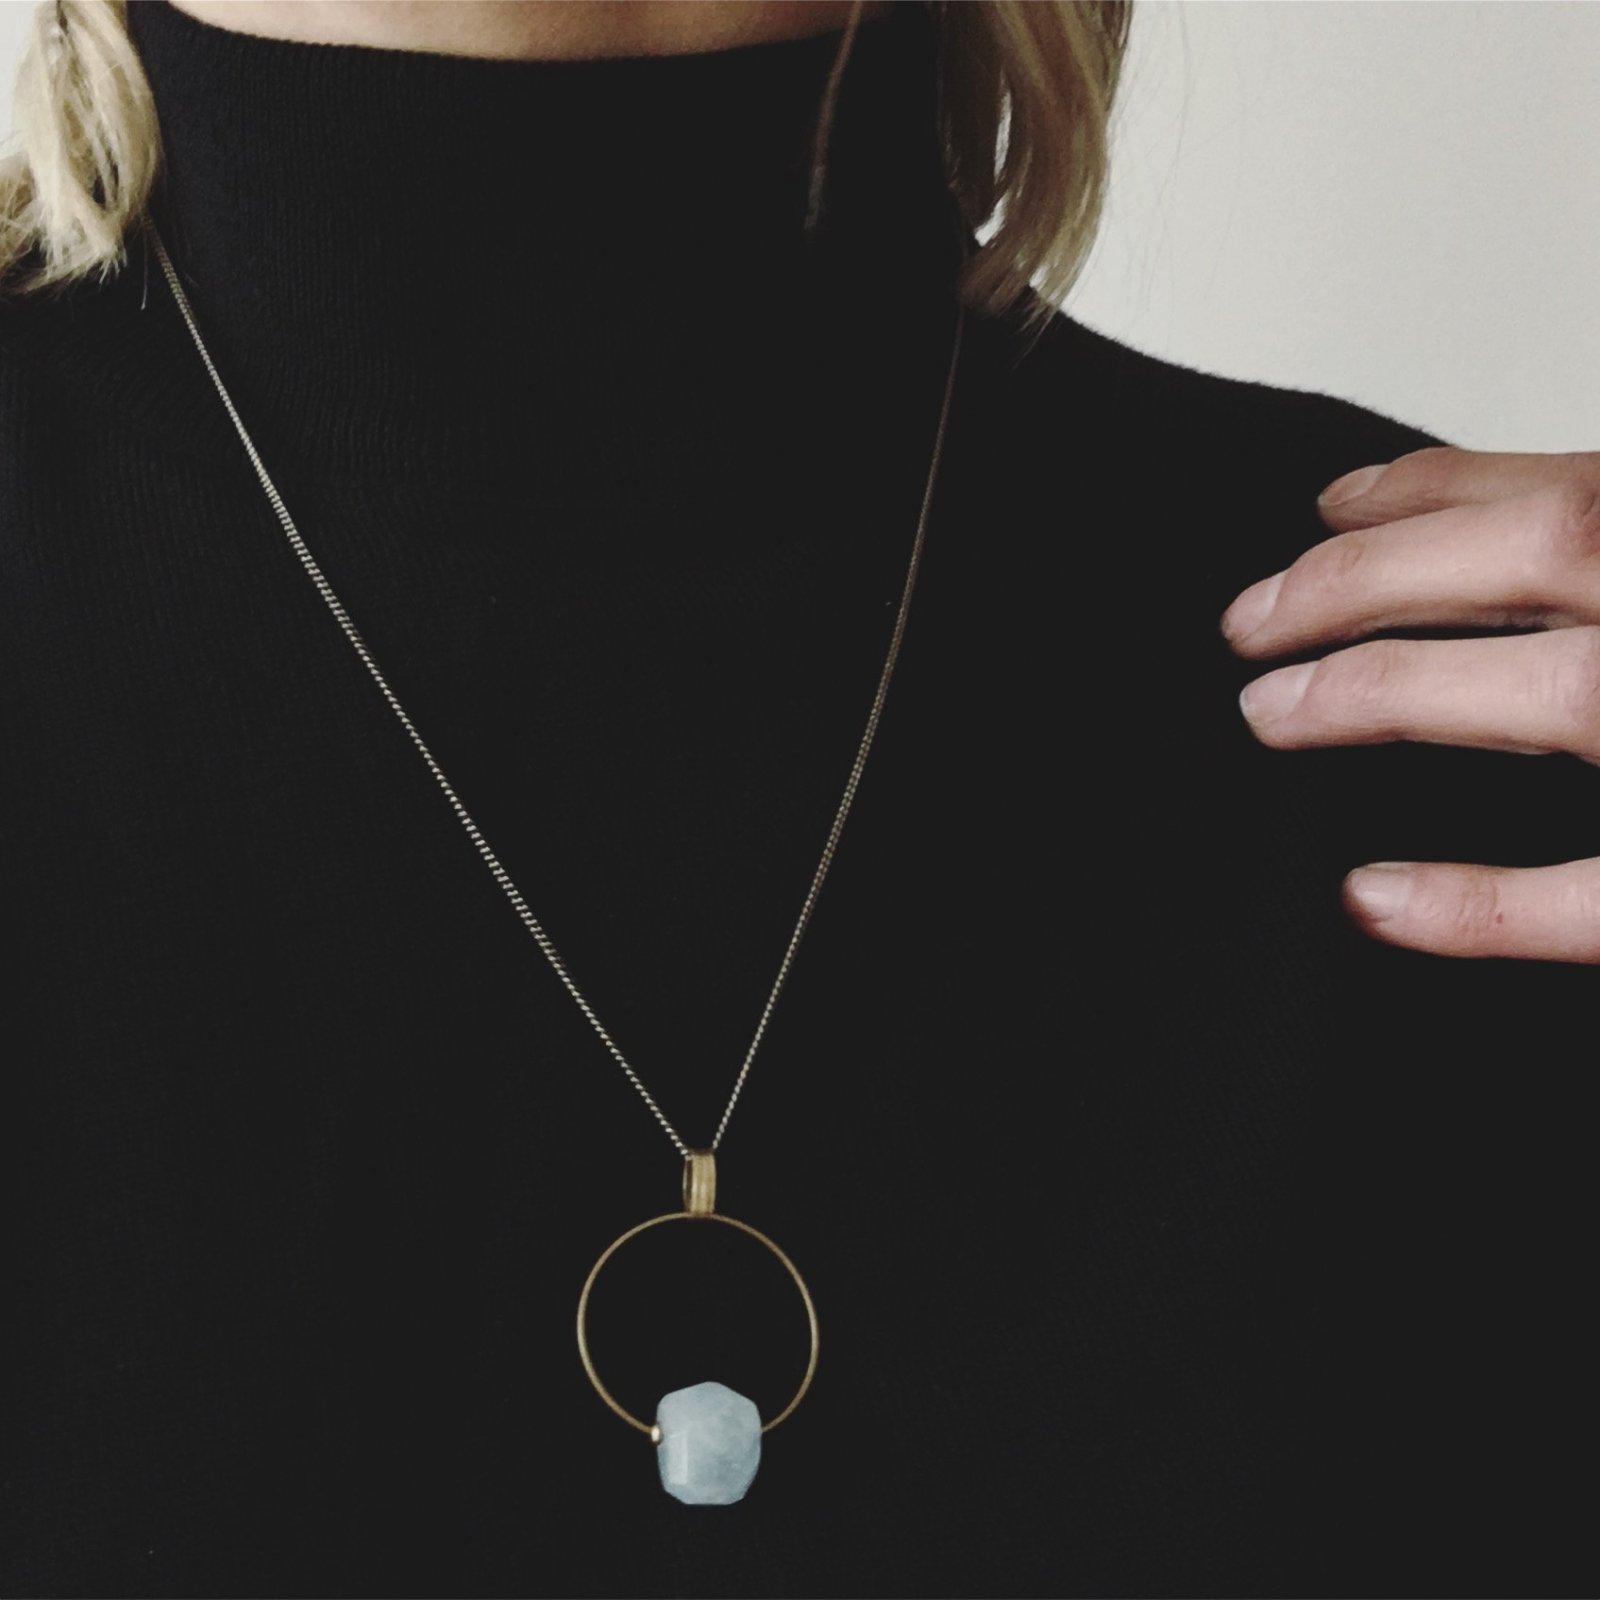 Lina Aquamarine 28 Necklace